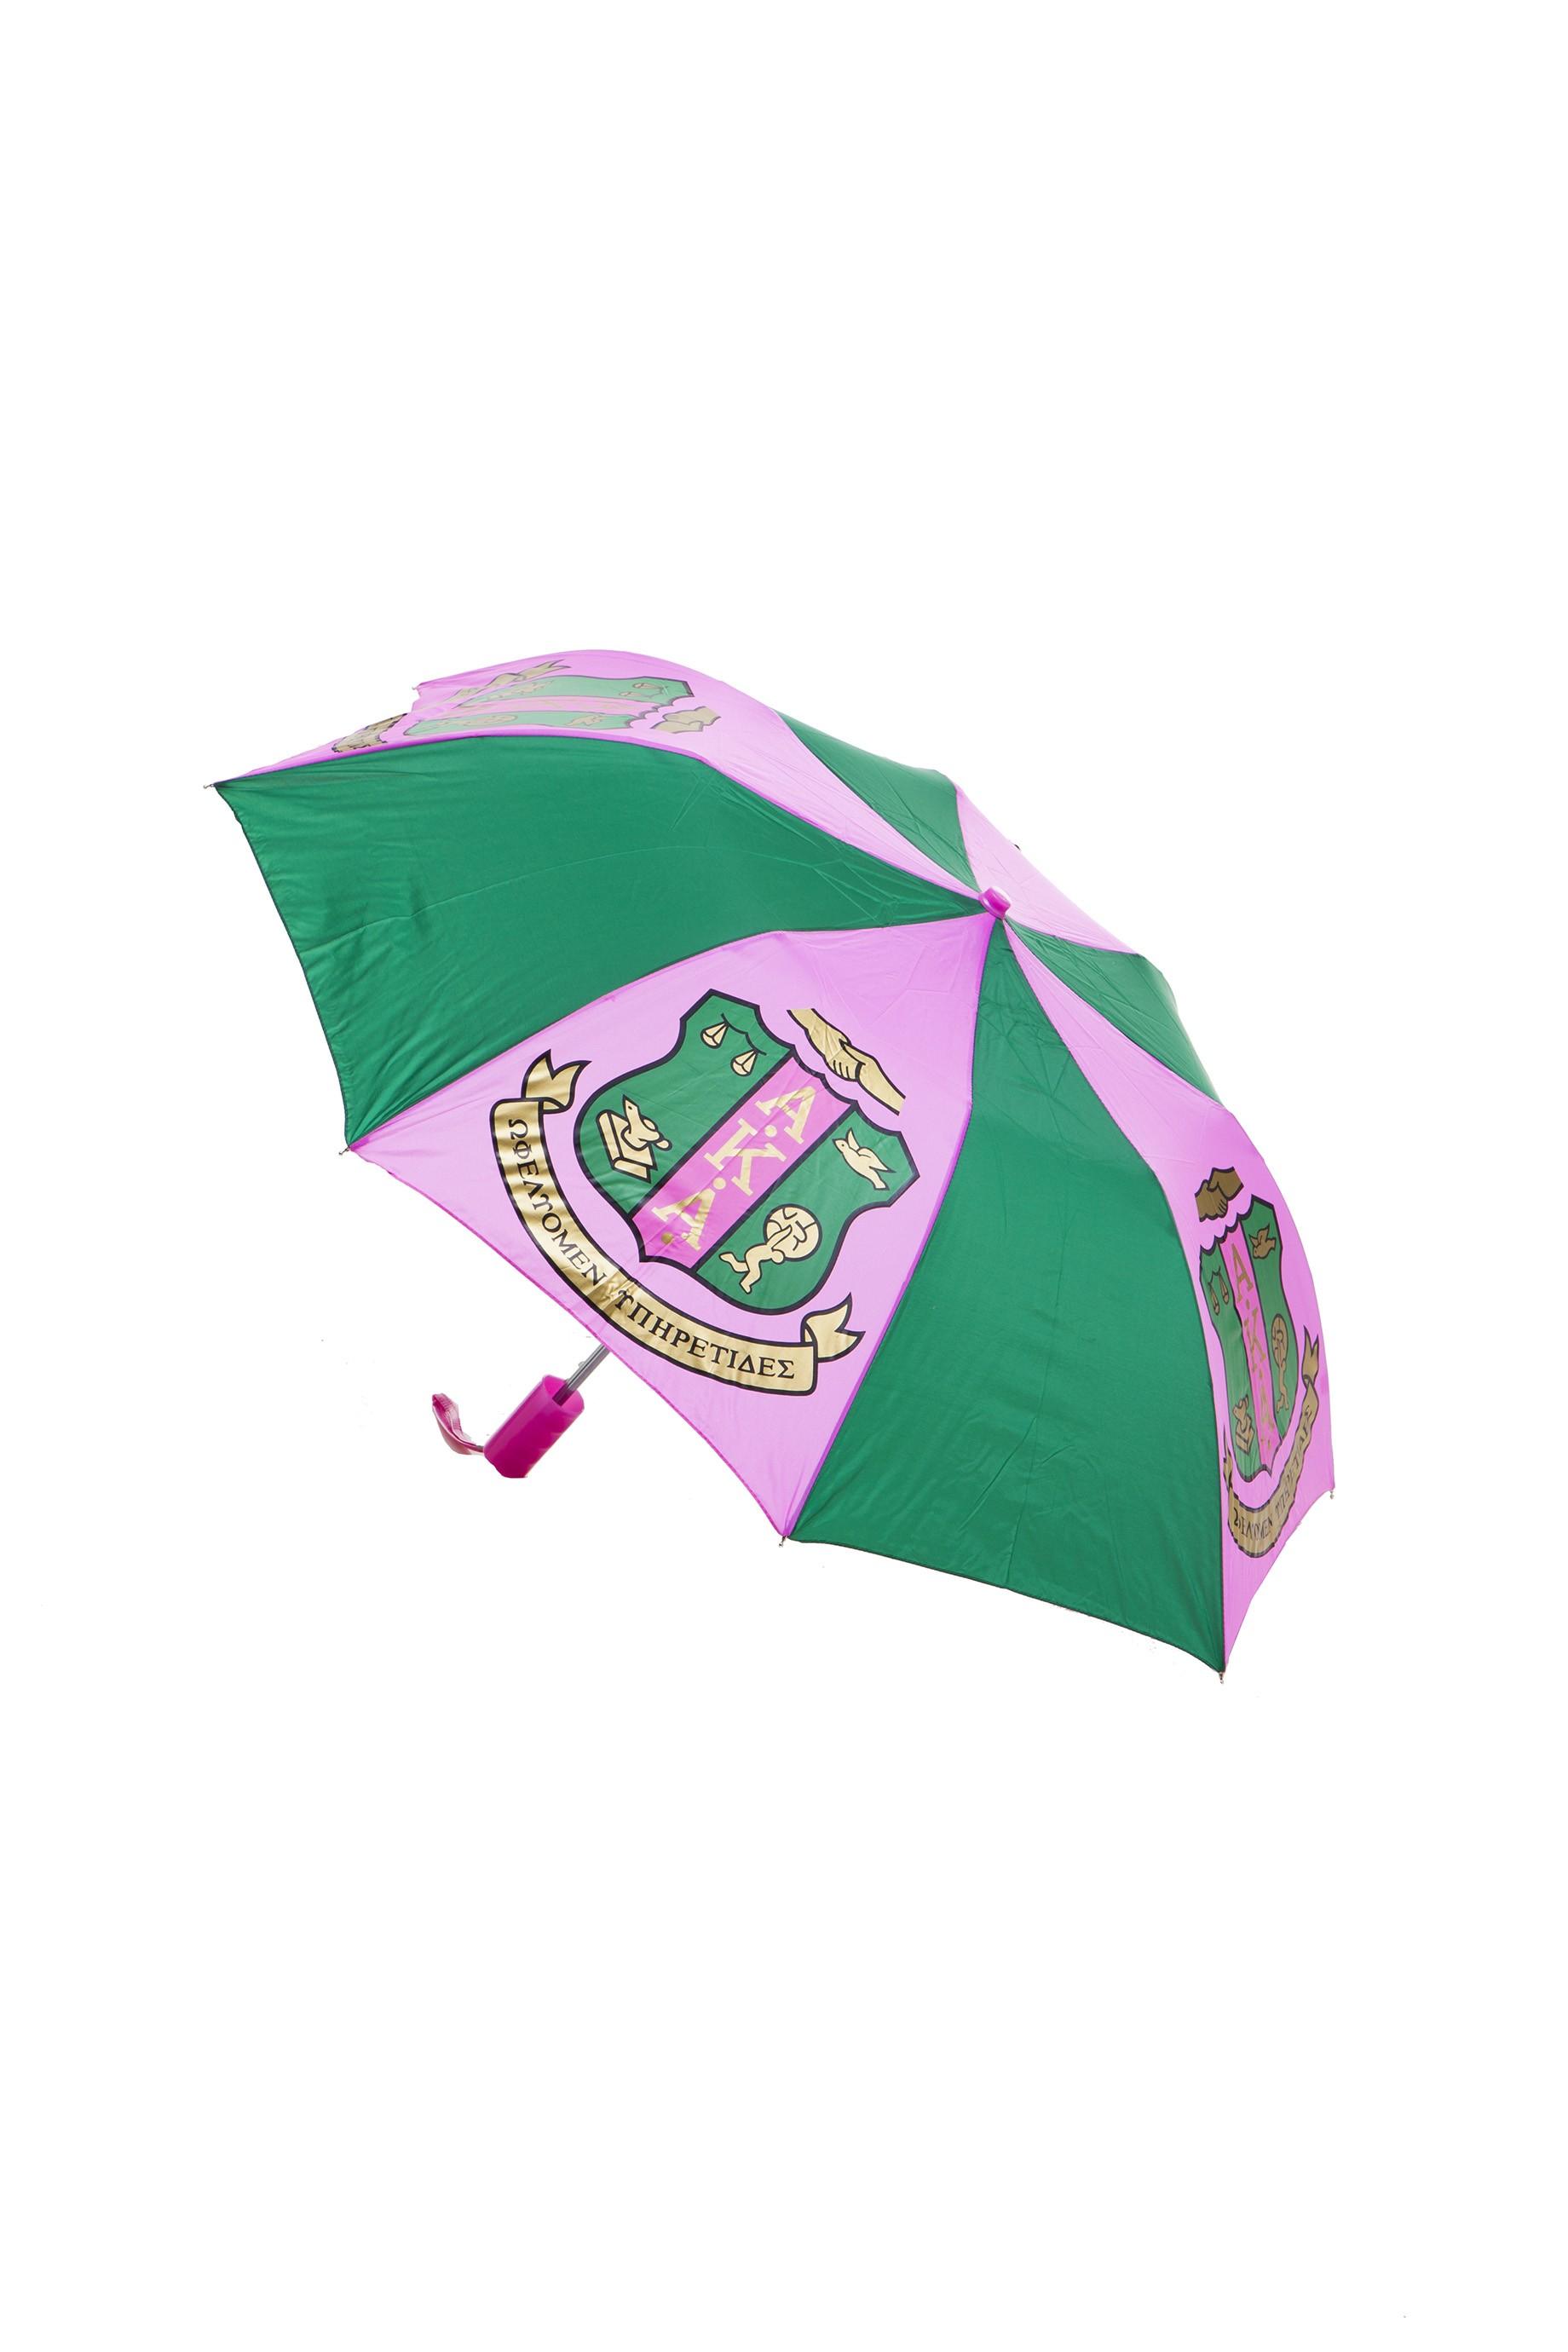 Folding Umbrella 10 Inch Shield-Alpha Kappa Alpha